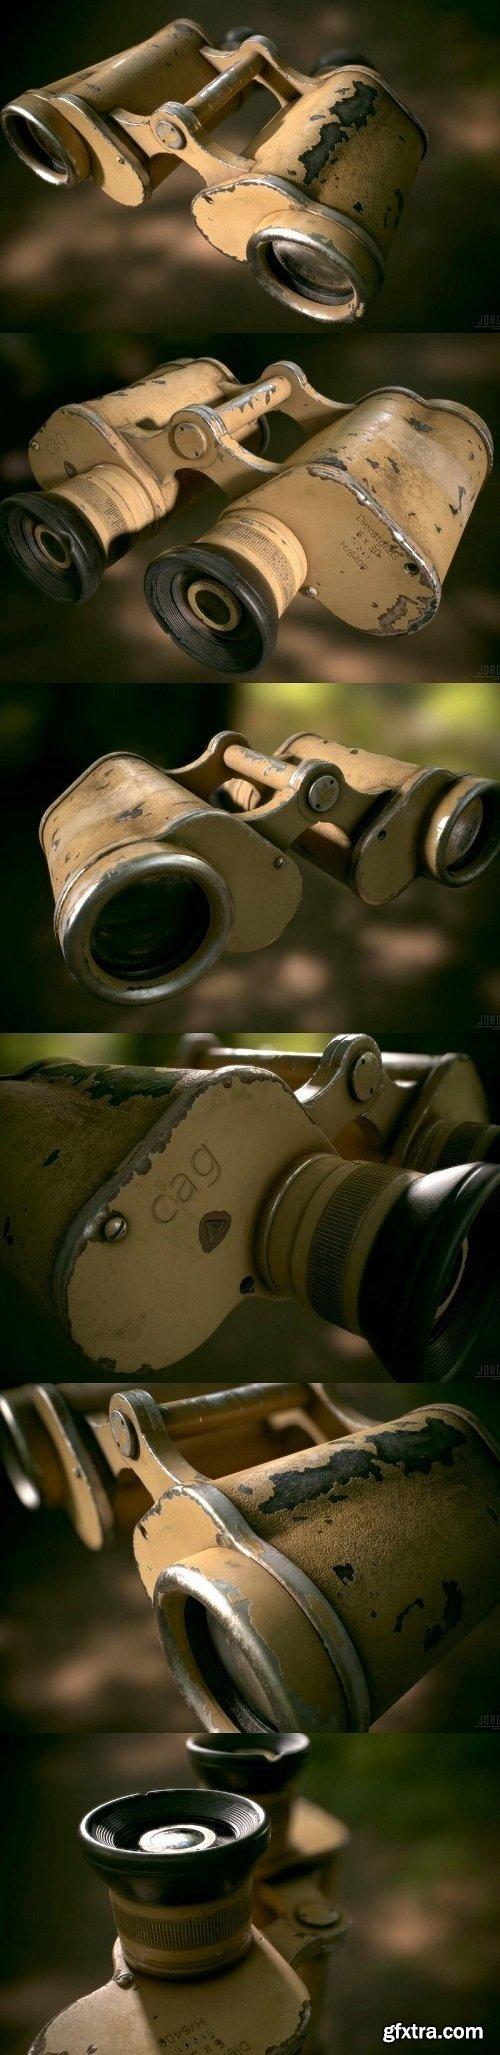 WW2 German Military Afrika Corps Binoculars